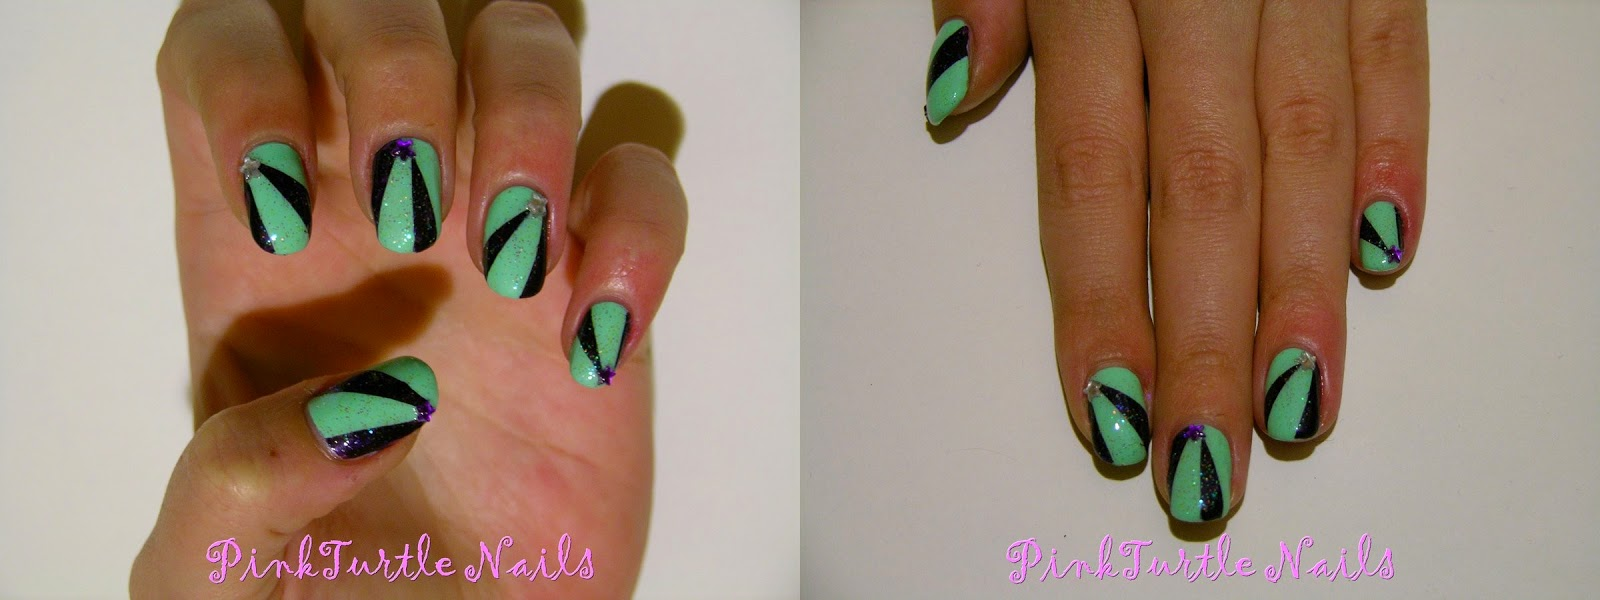 http://pinkturtlenails.blogspot.com.es/2015/03/reto-31-dias-recrea-tu-nail-art-favorito.html